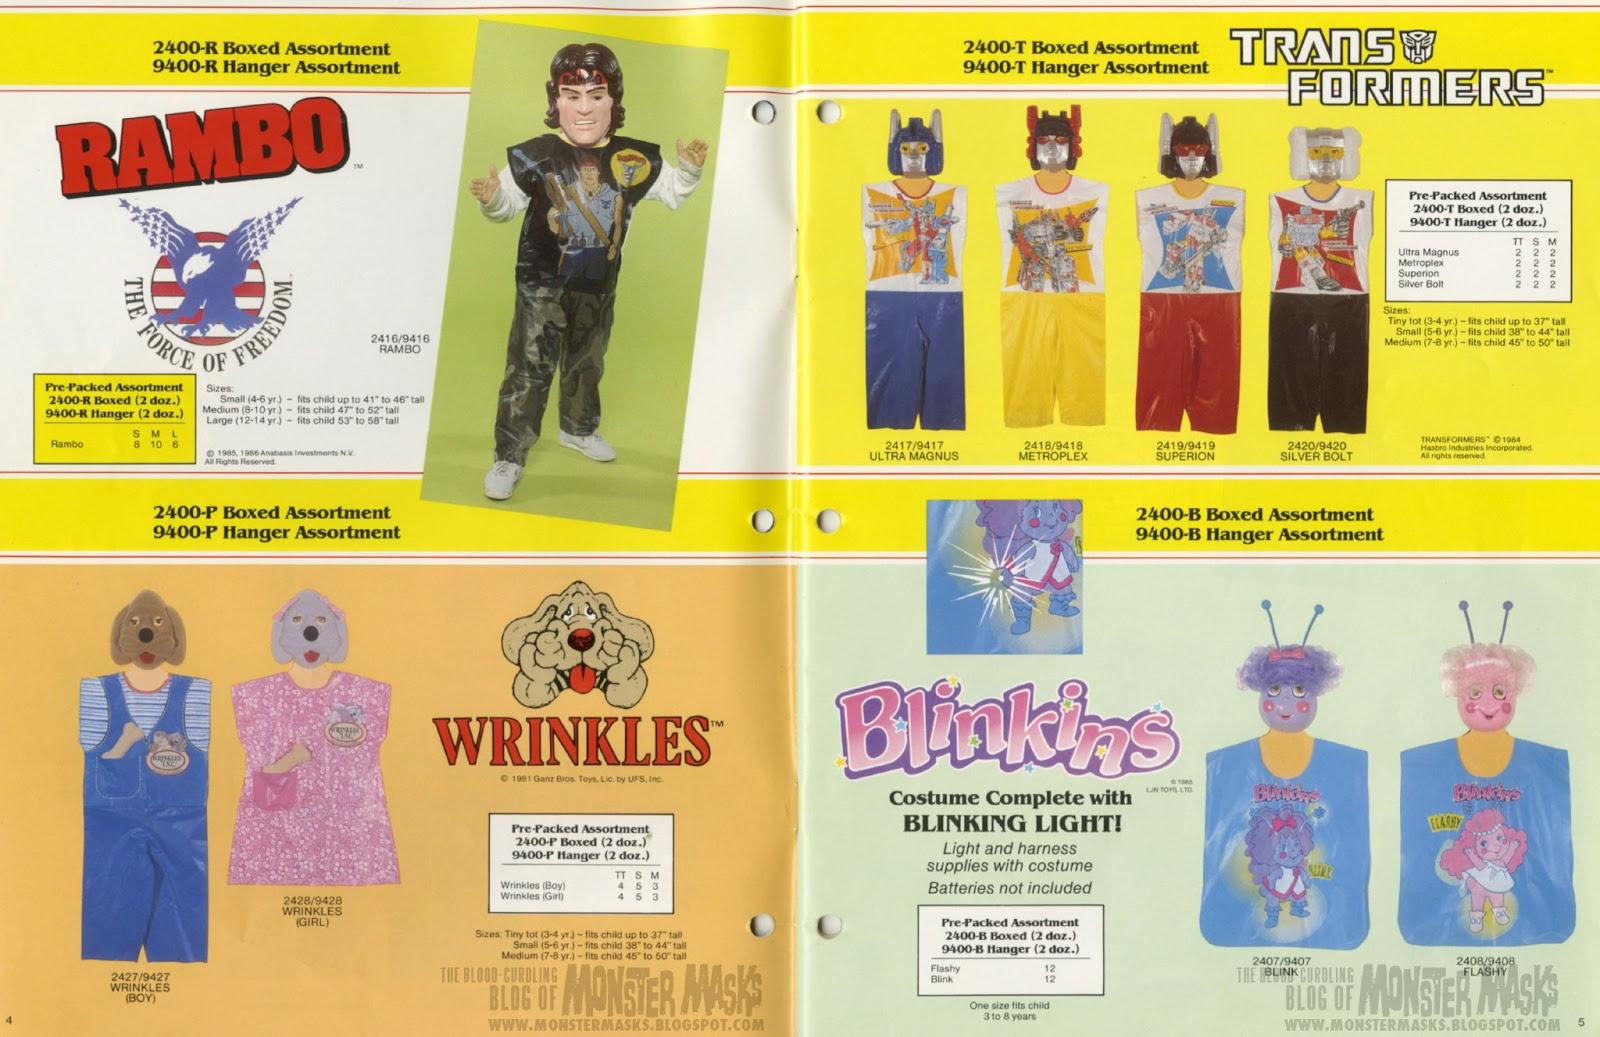 1987_CollegevilleCostumes_Catalog_04-05 & Transformers | 2 Warps to Neptune